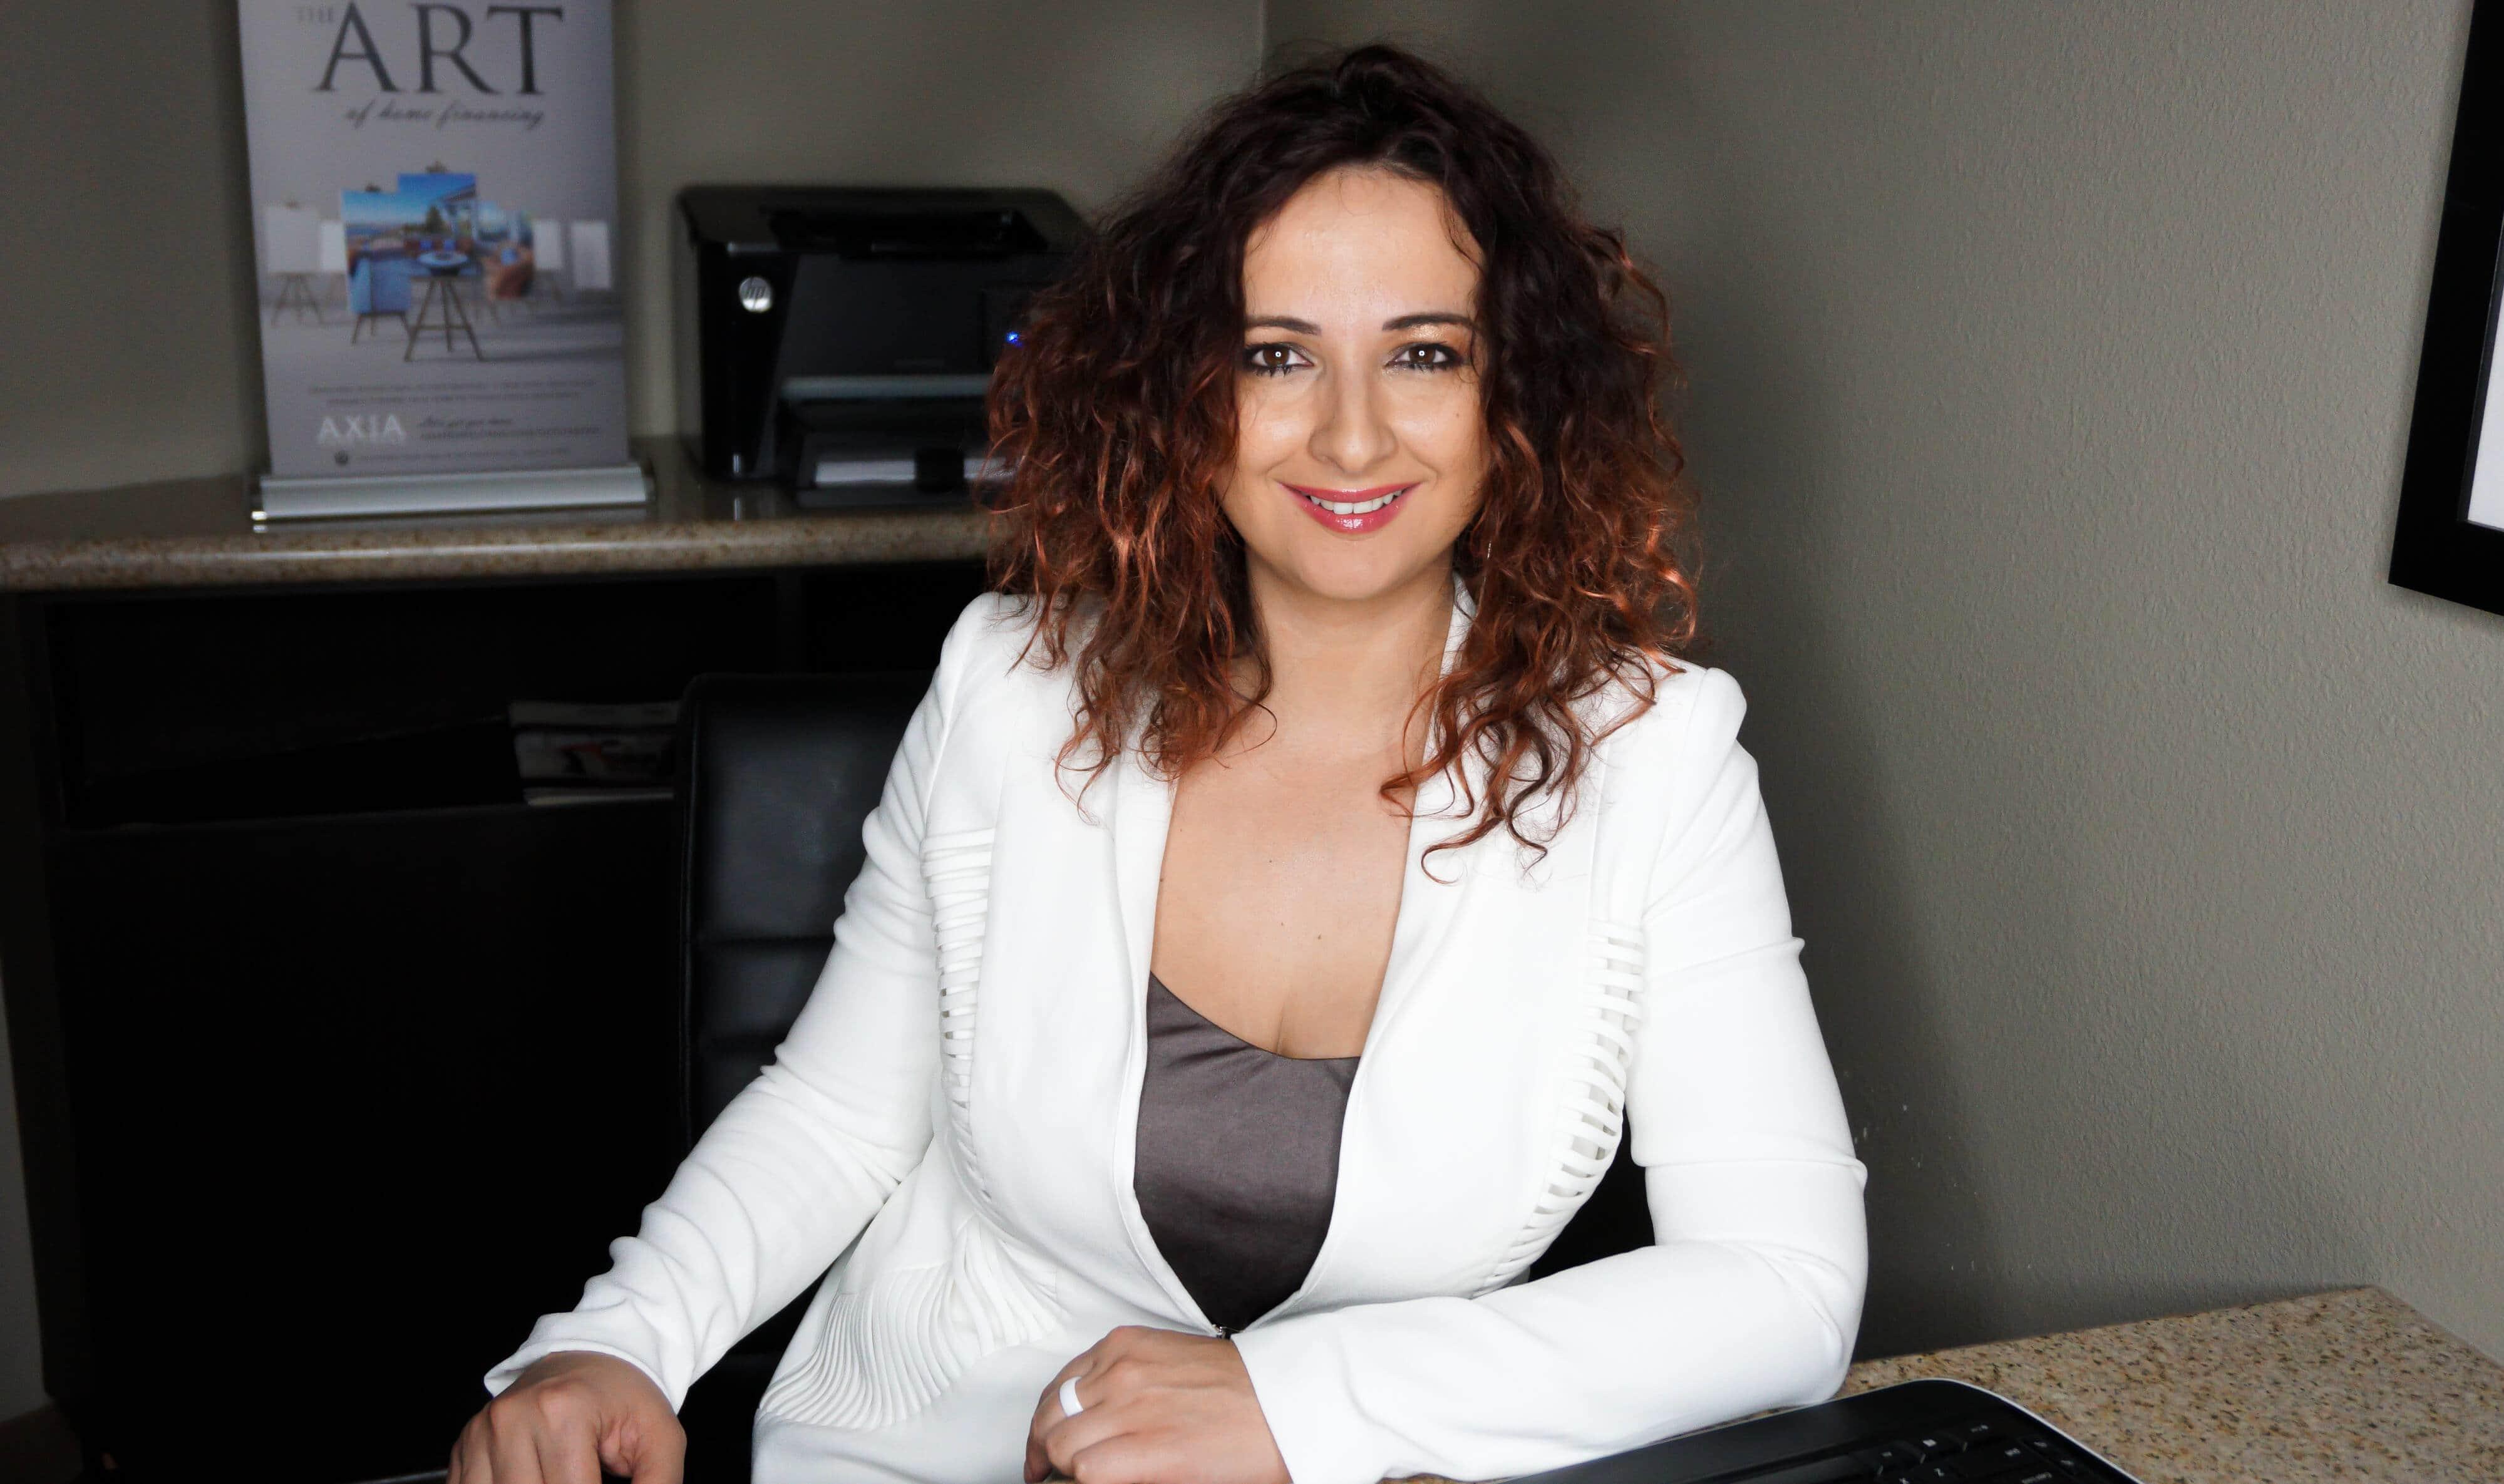 Severina Chernaev